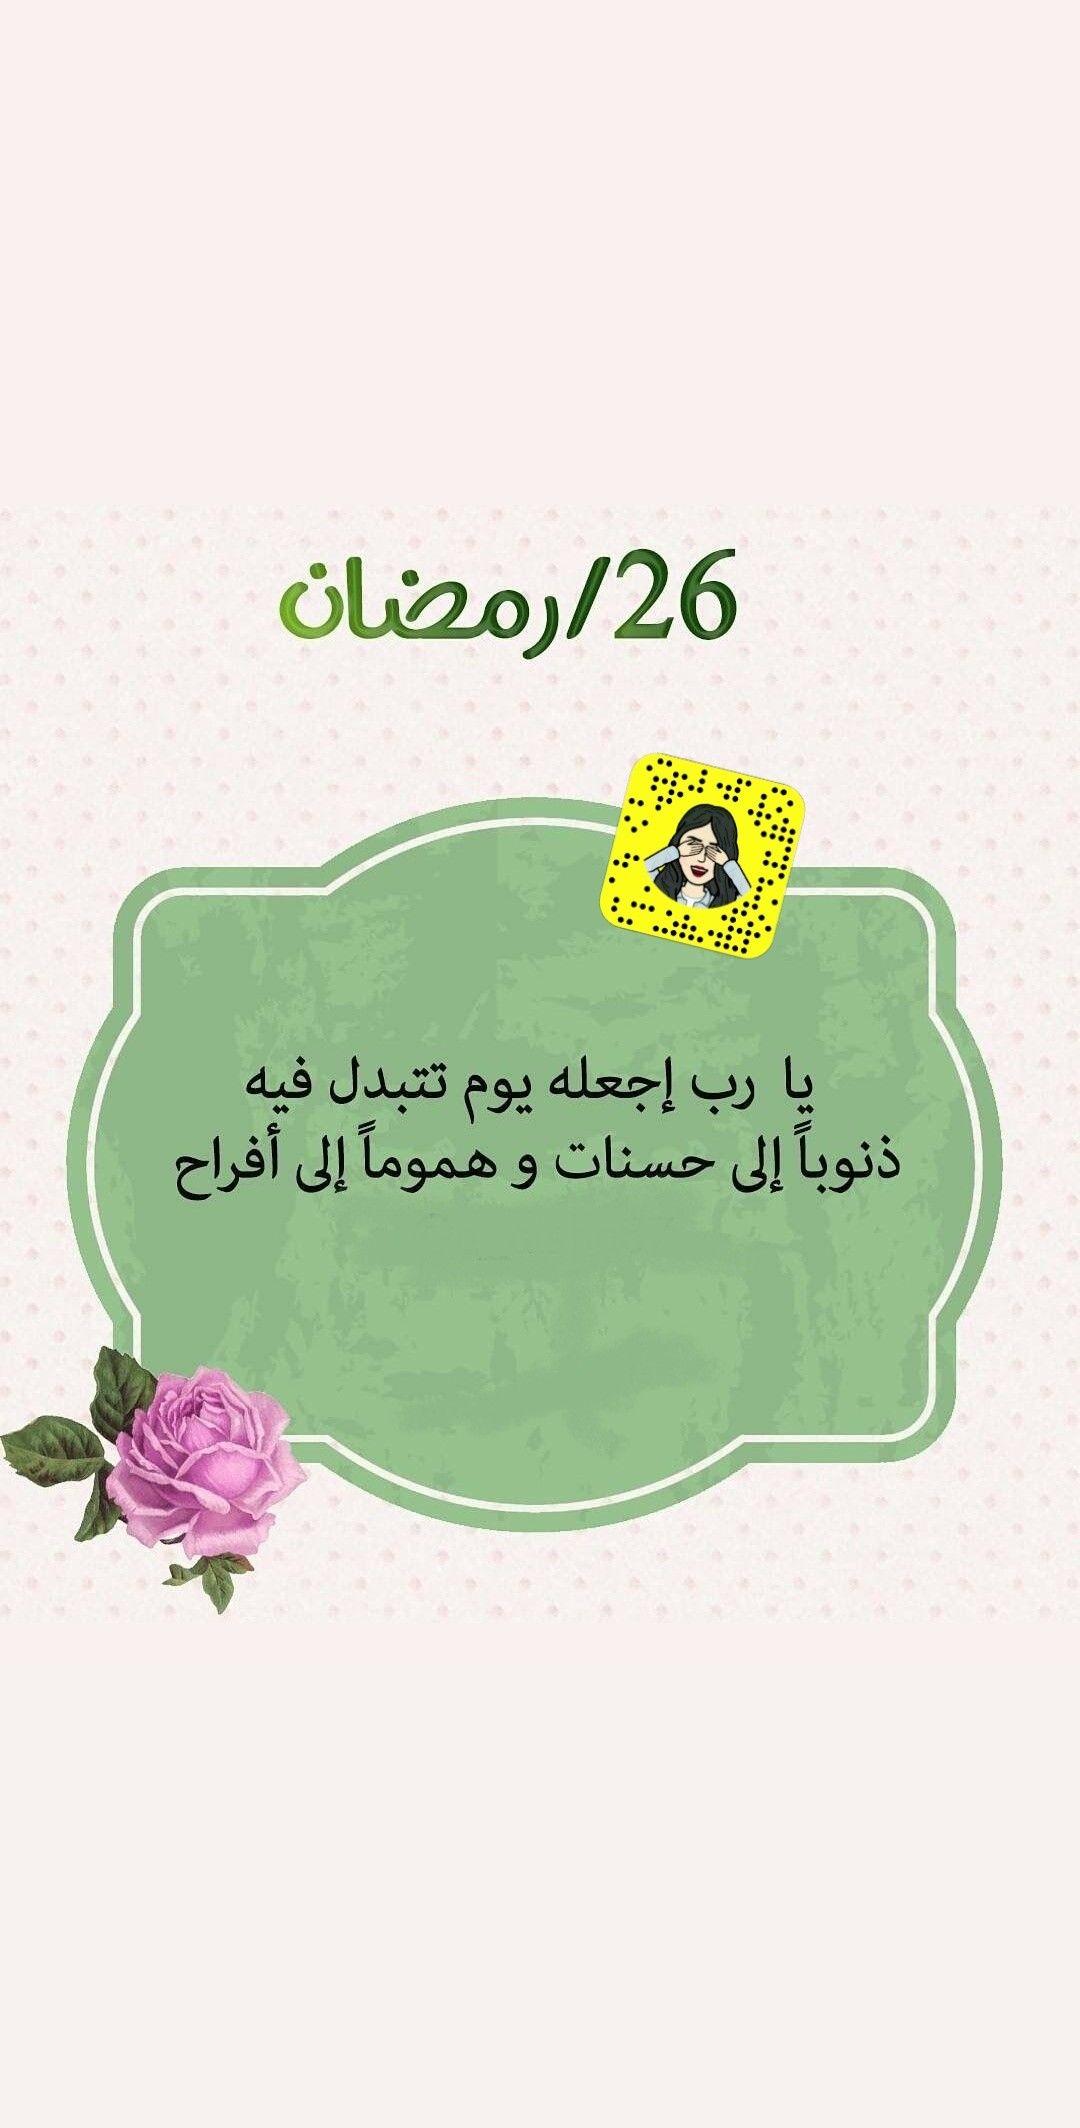 Pin By Heja Piro On القران الكريم Ramadan Quotes Ramadan Prayer Ramadan